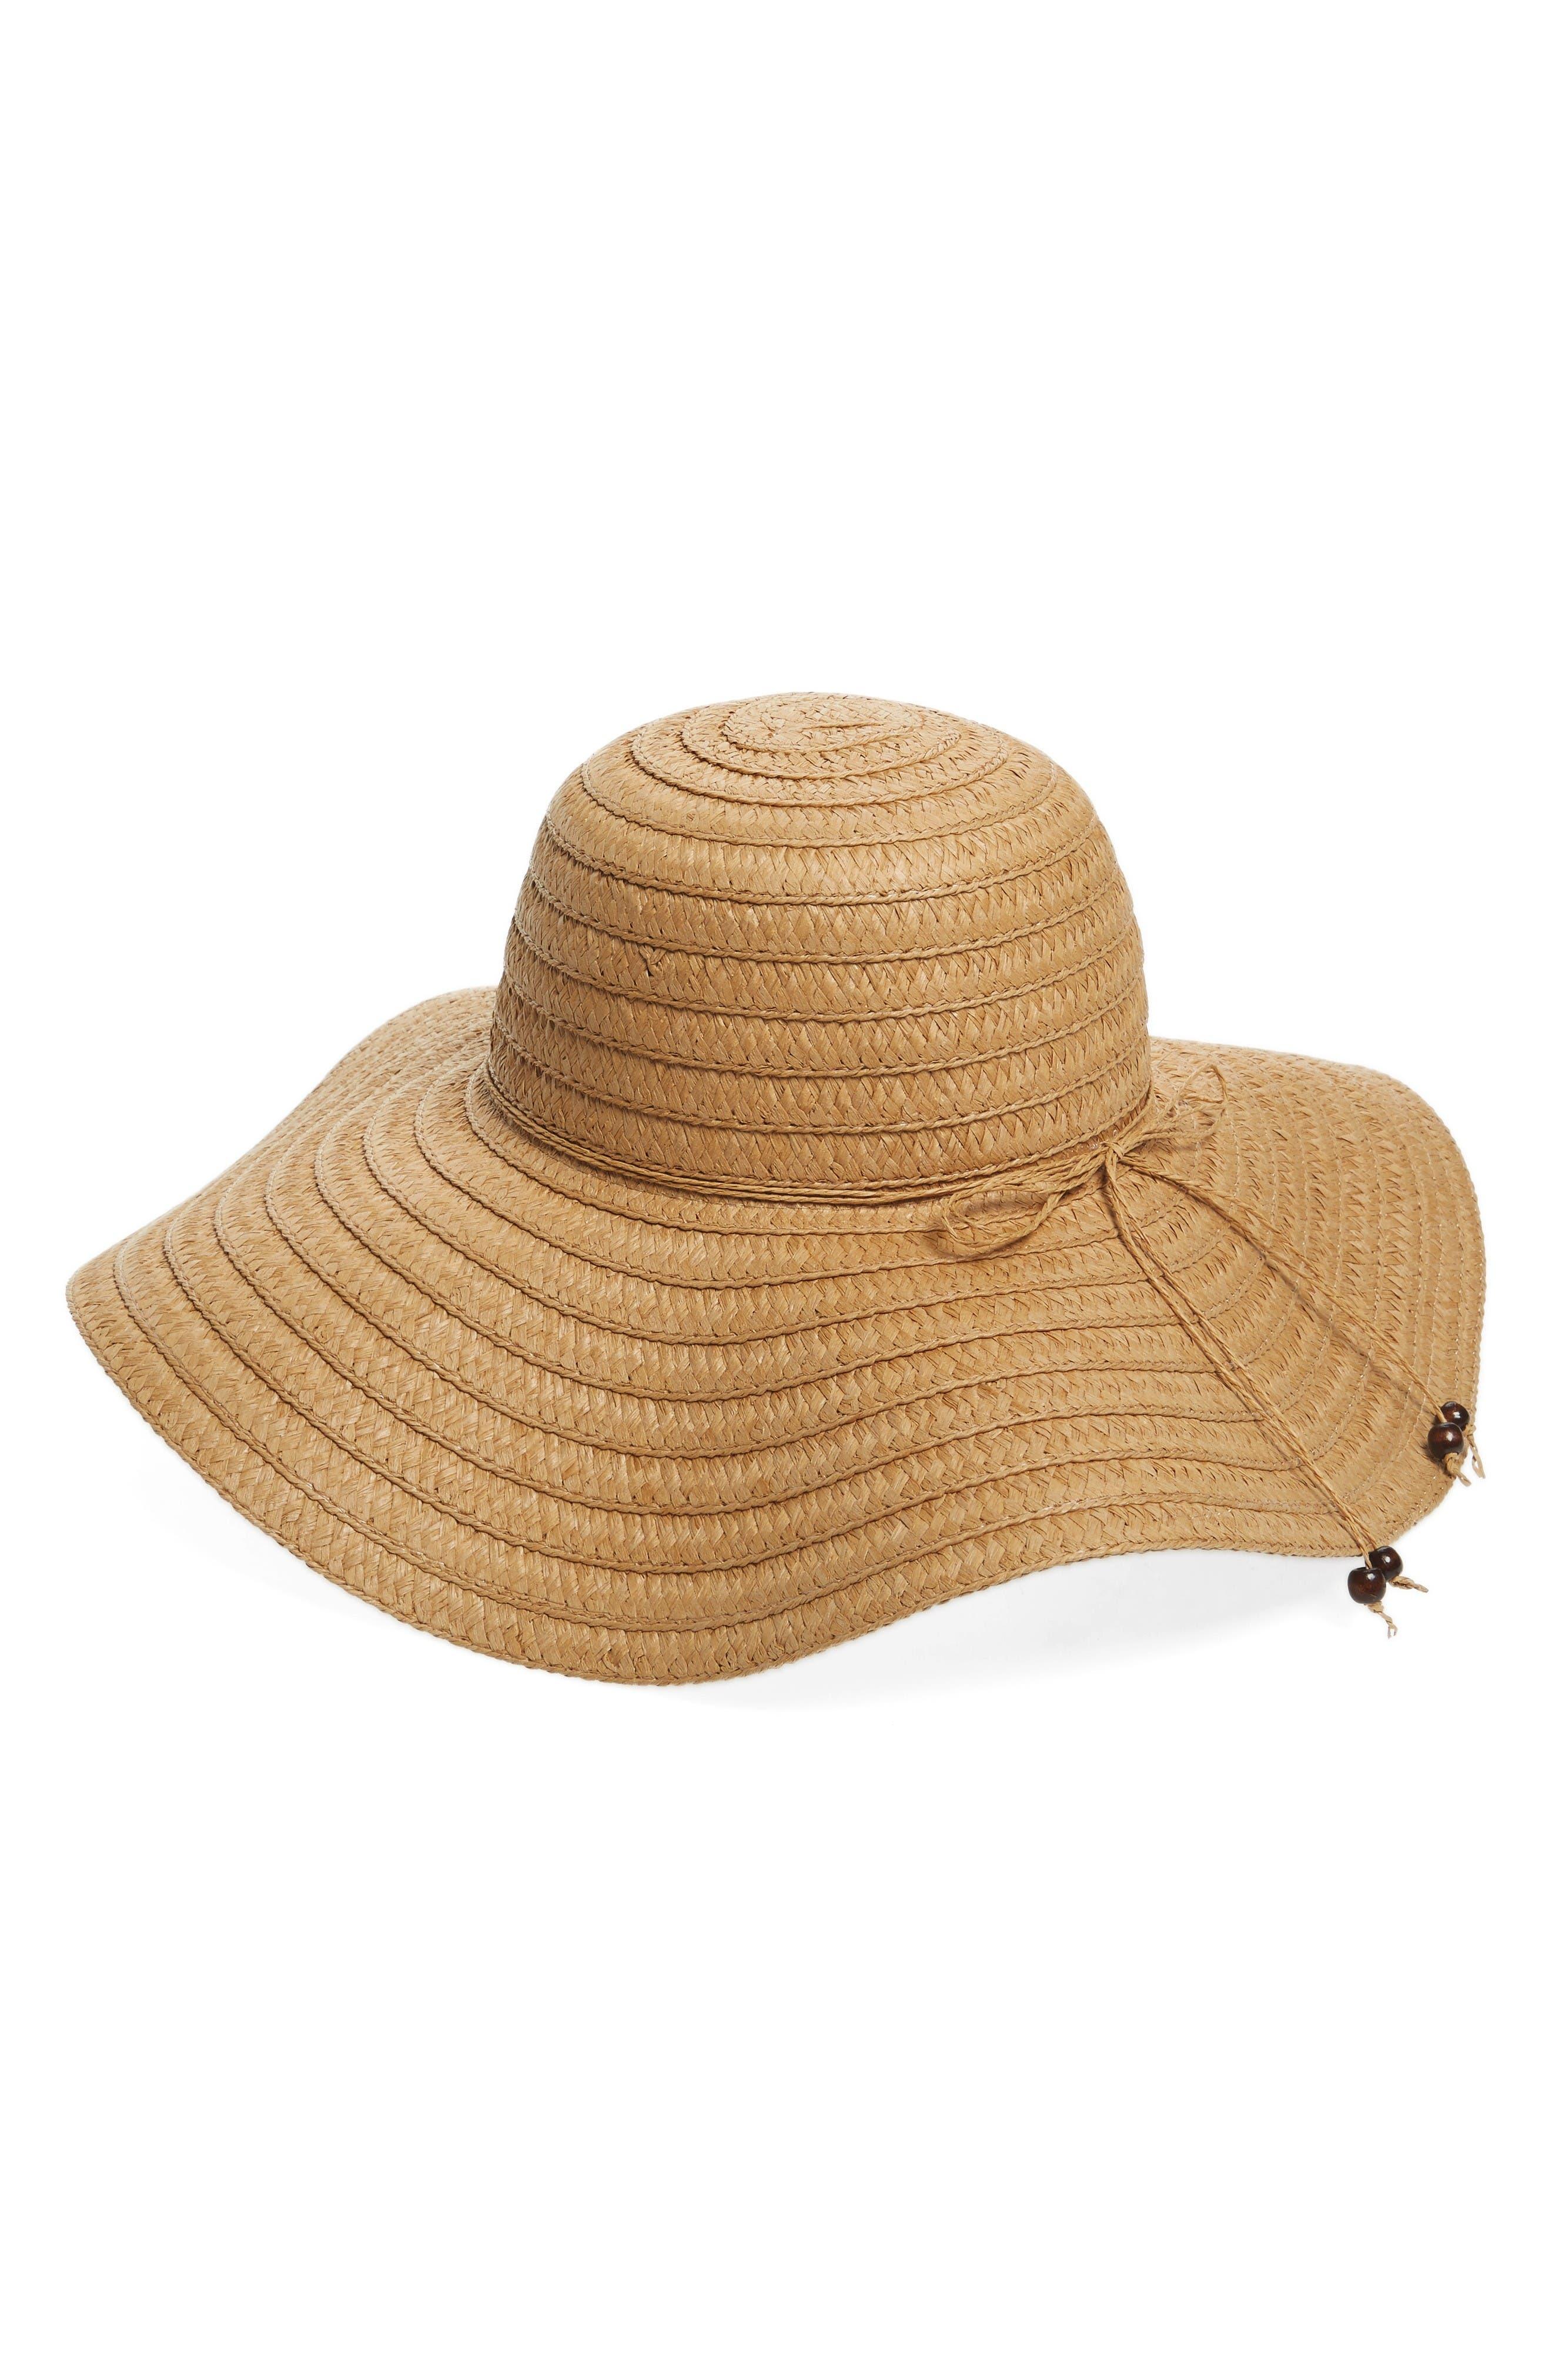 Alternate Image 1 Selected - Emanuel Geraldo Floppy Straw Hat